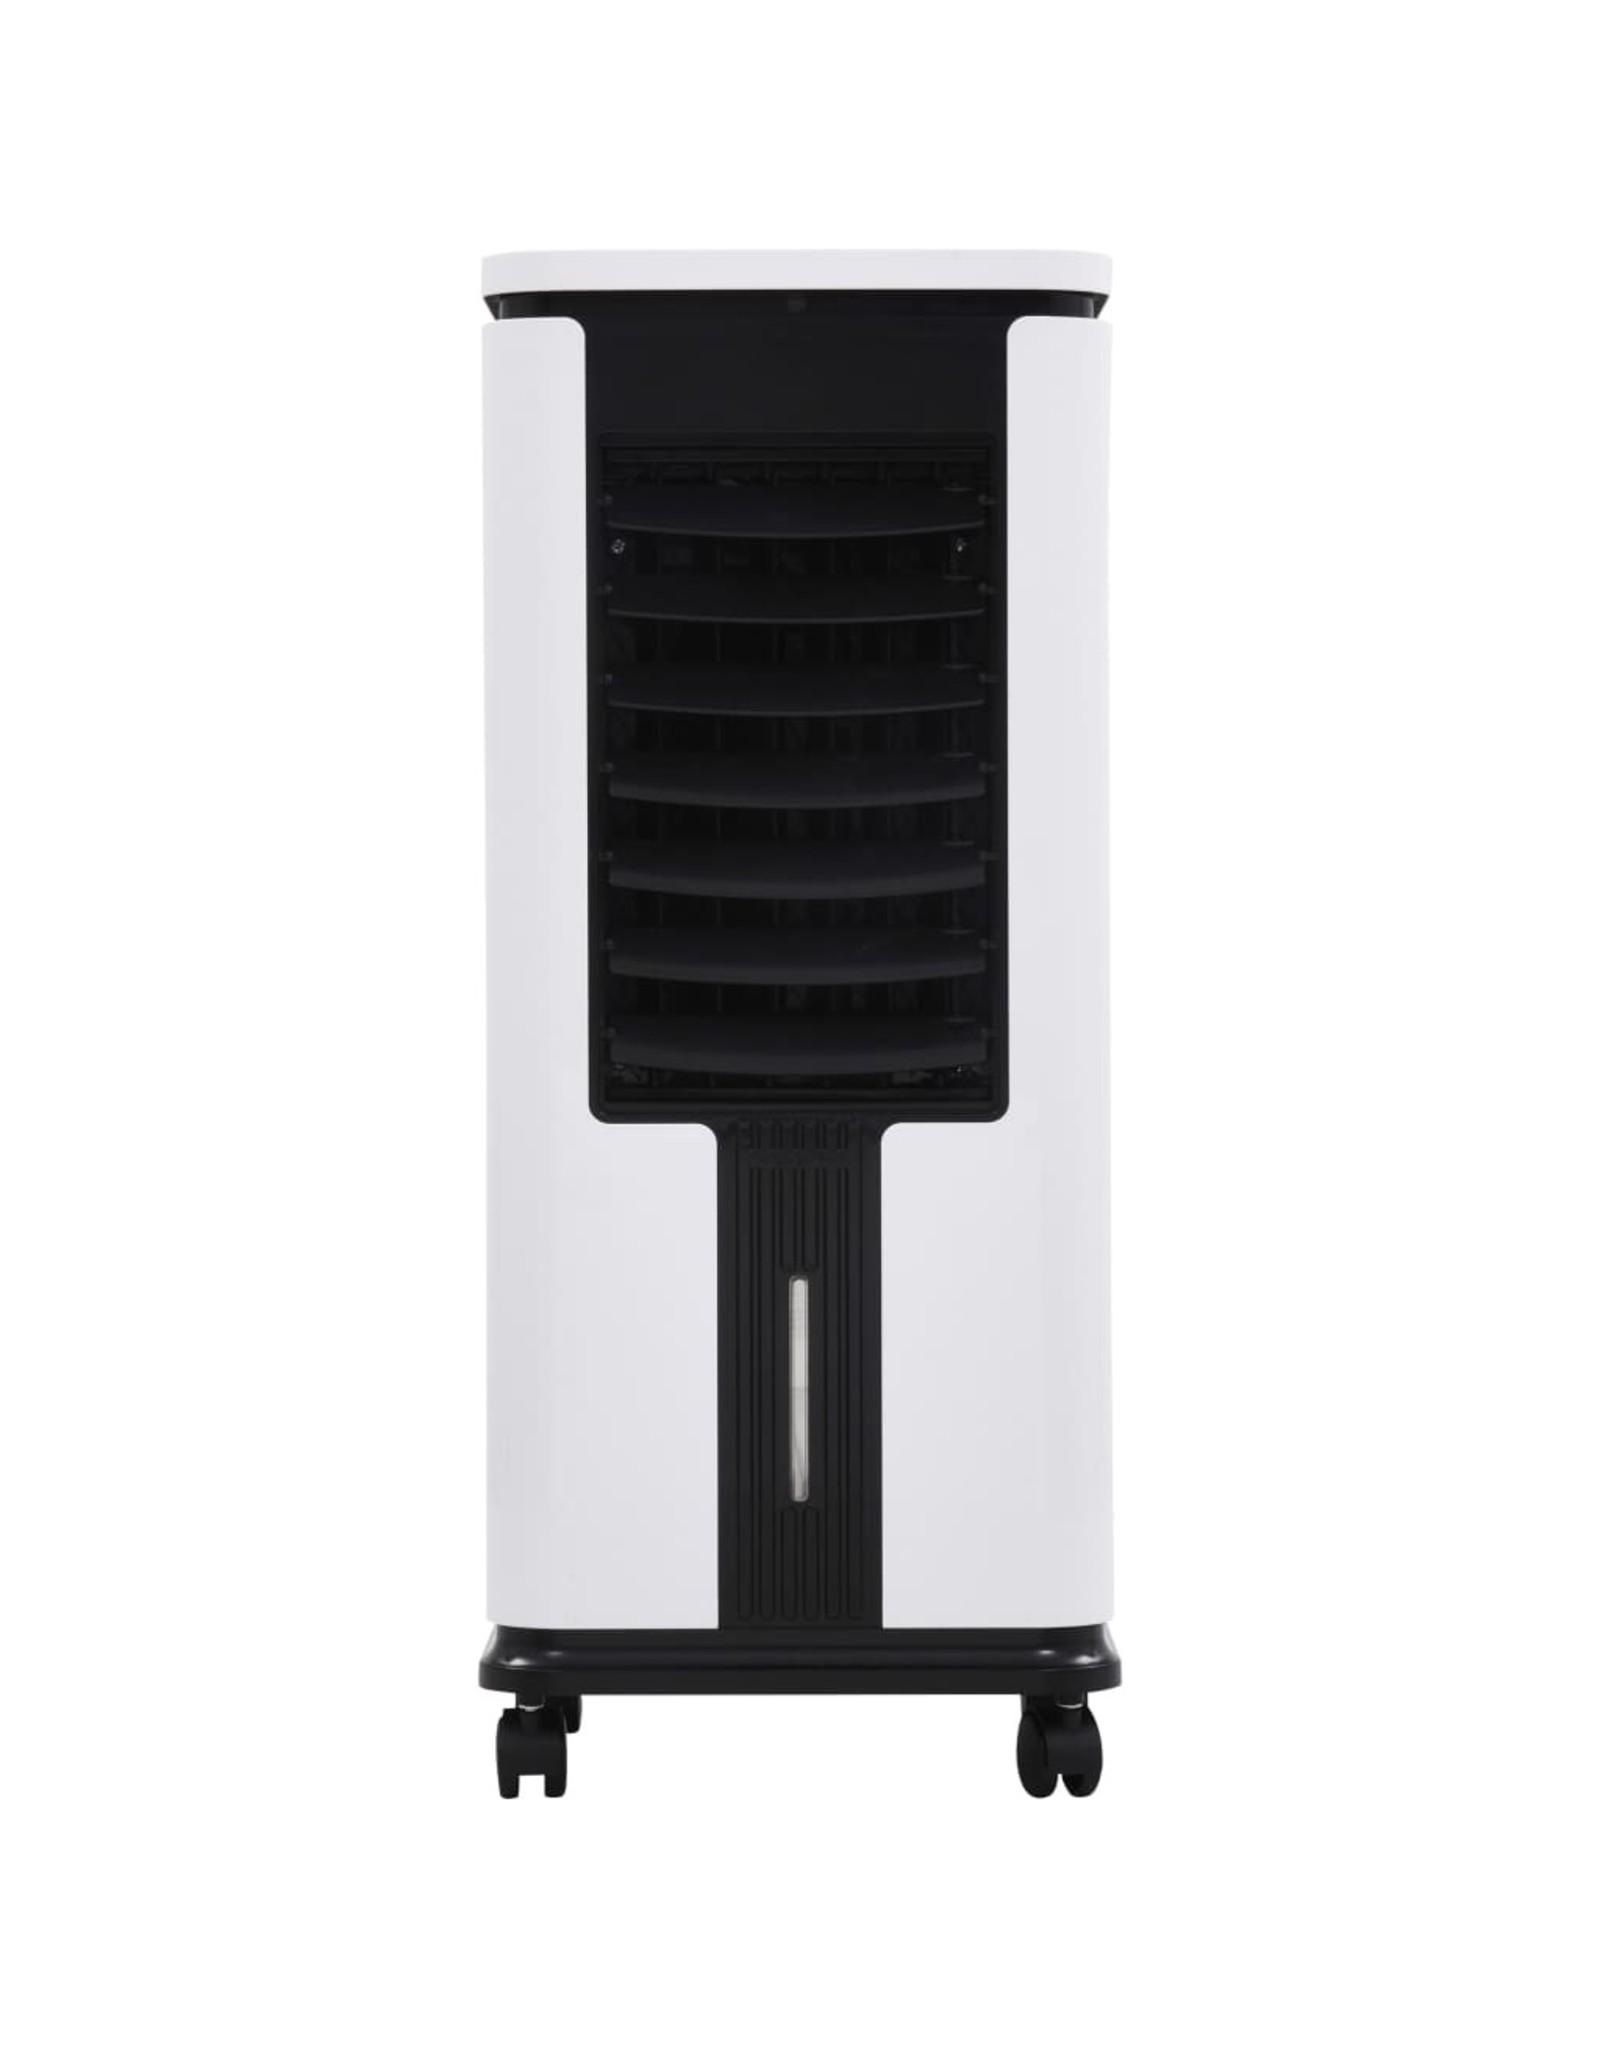 3-in-1 Luchtbevochtiger mobiel Purifier 75 W